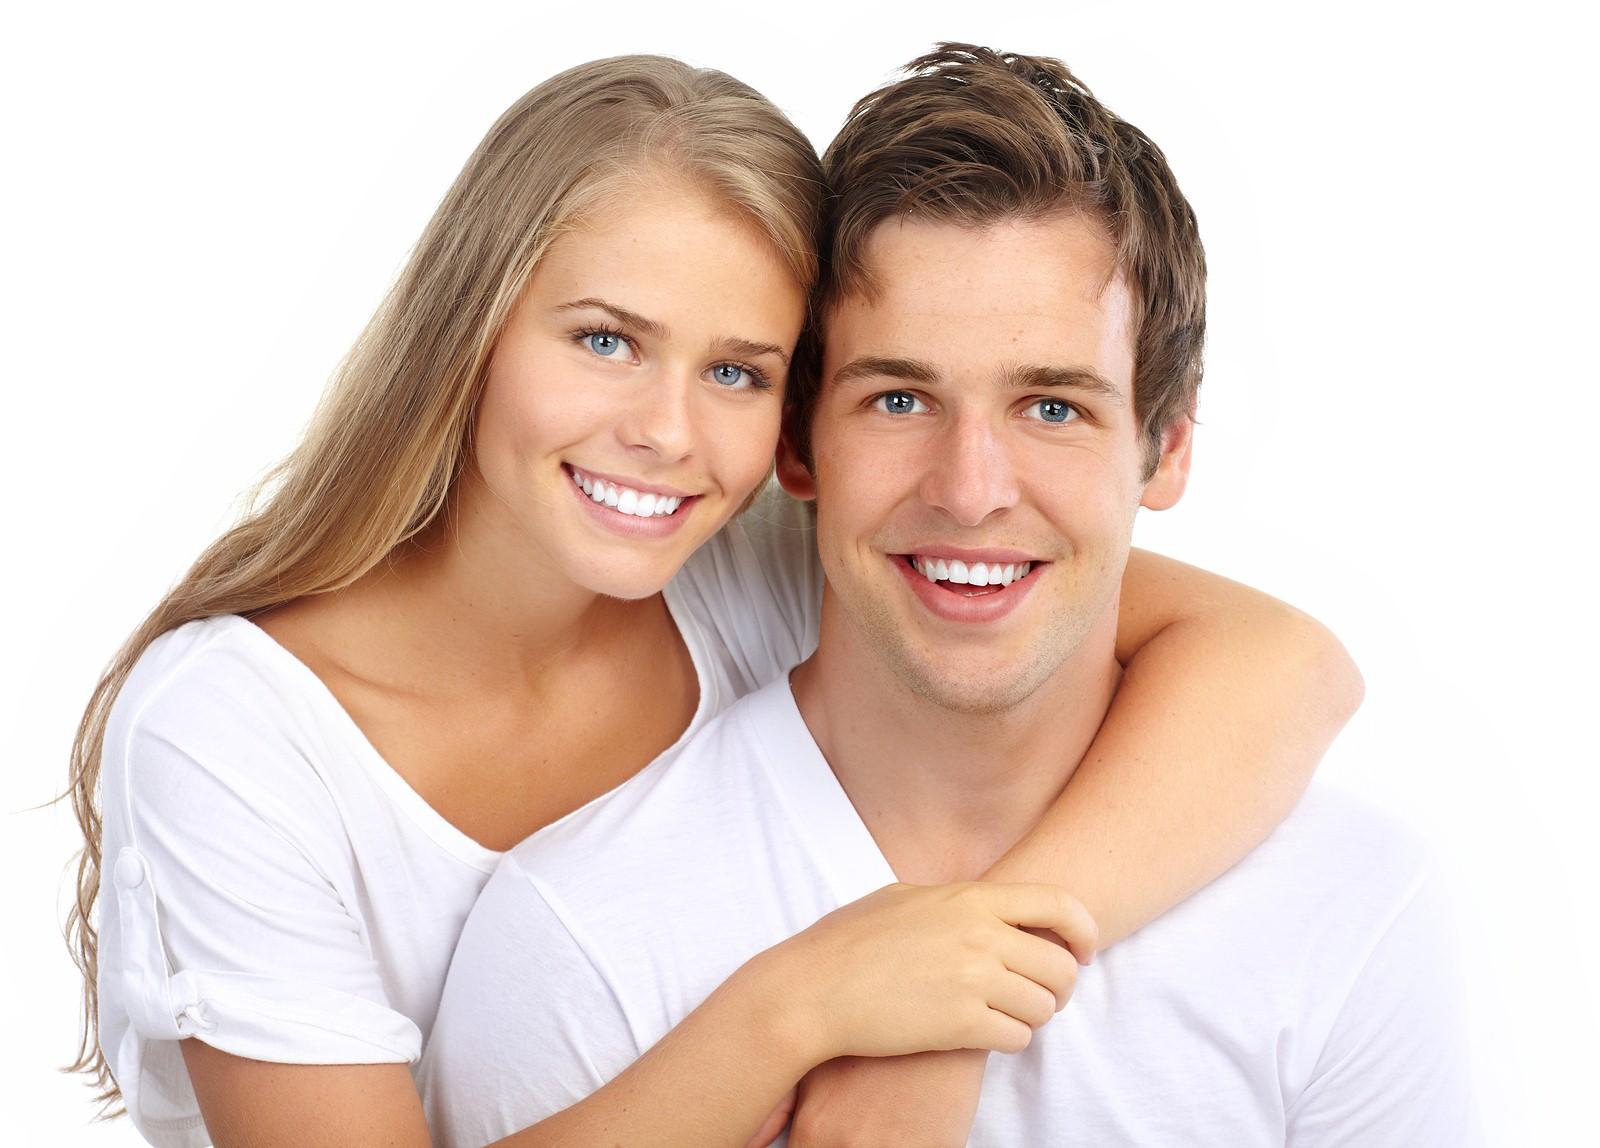 Happy White Smiles